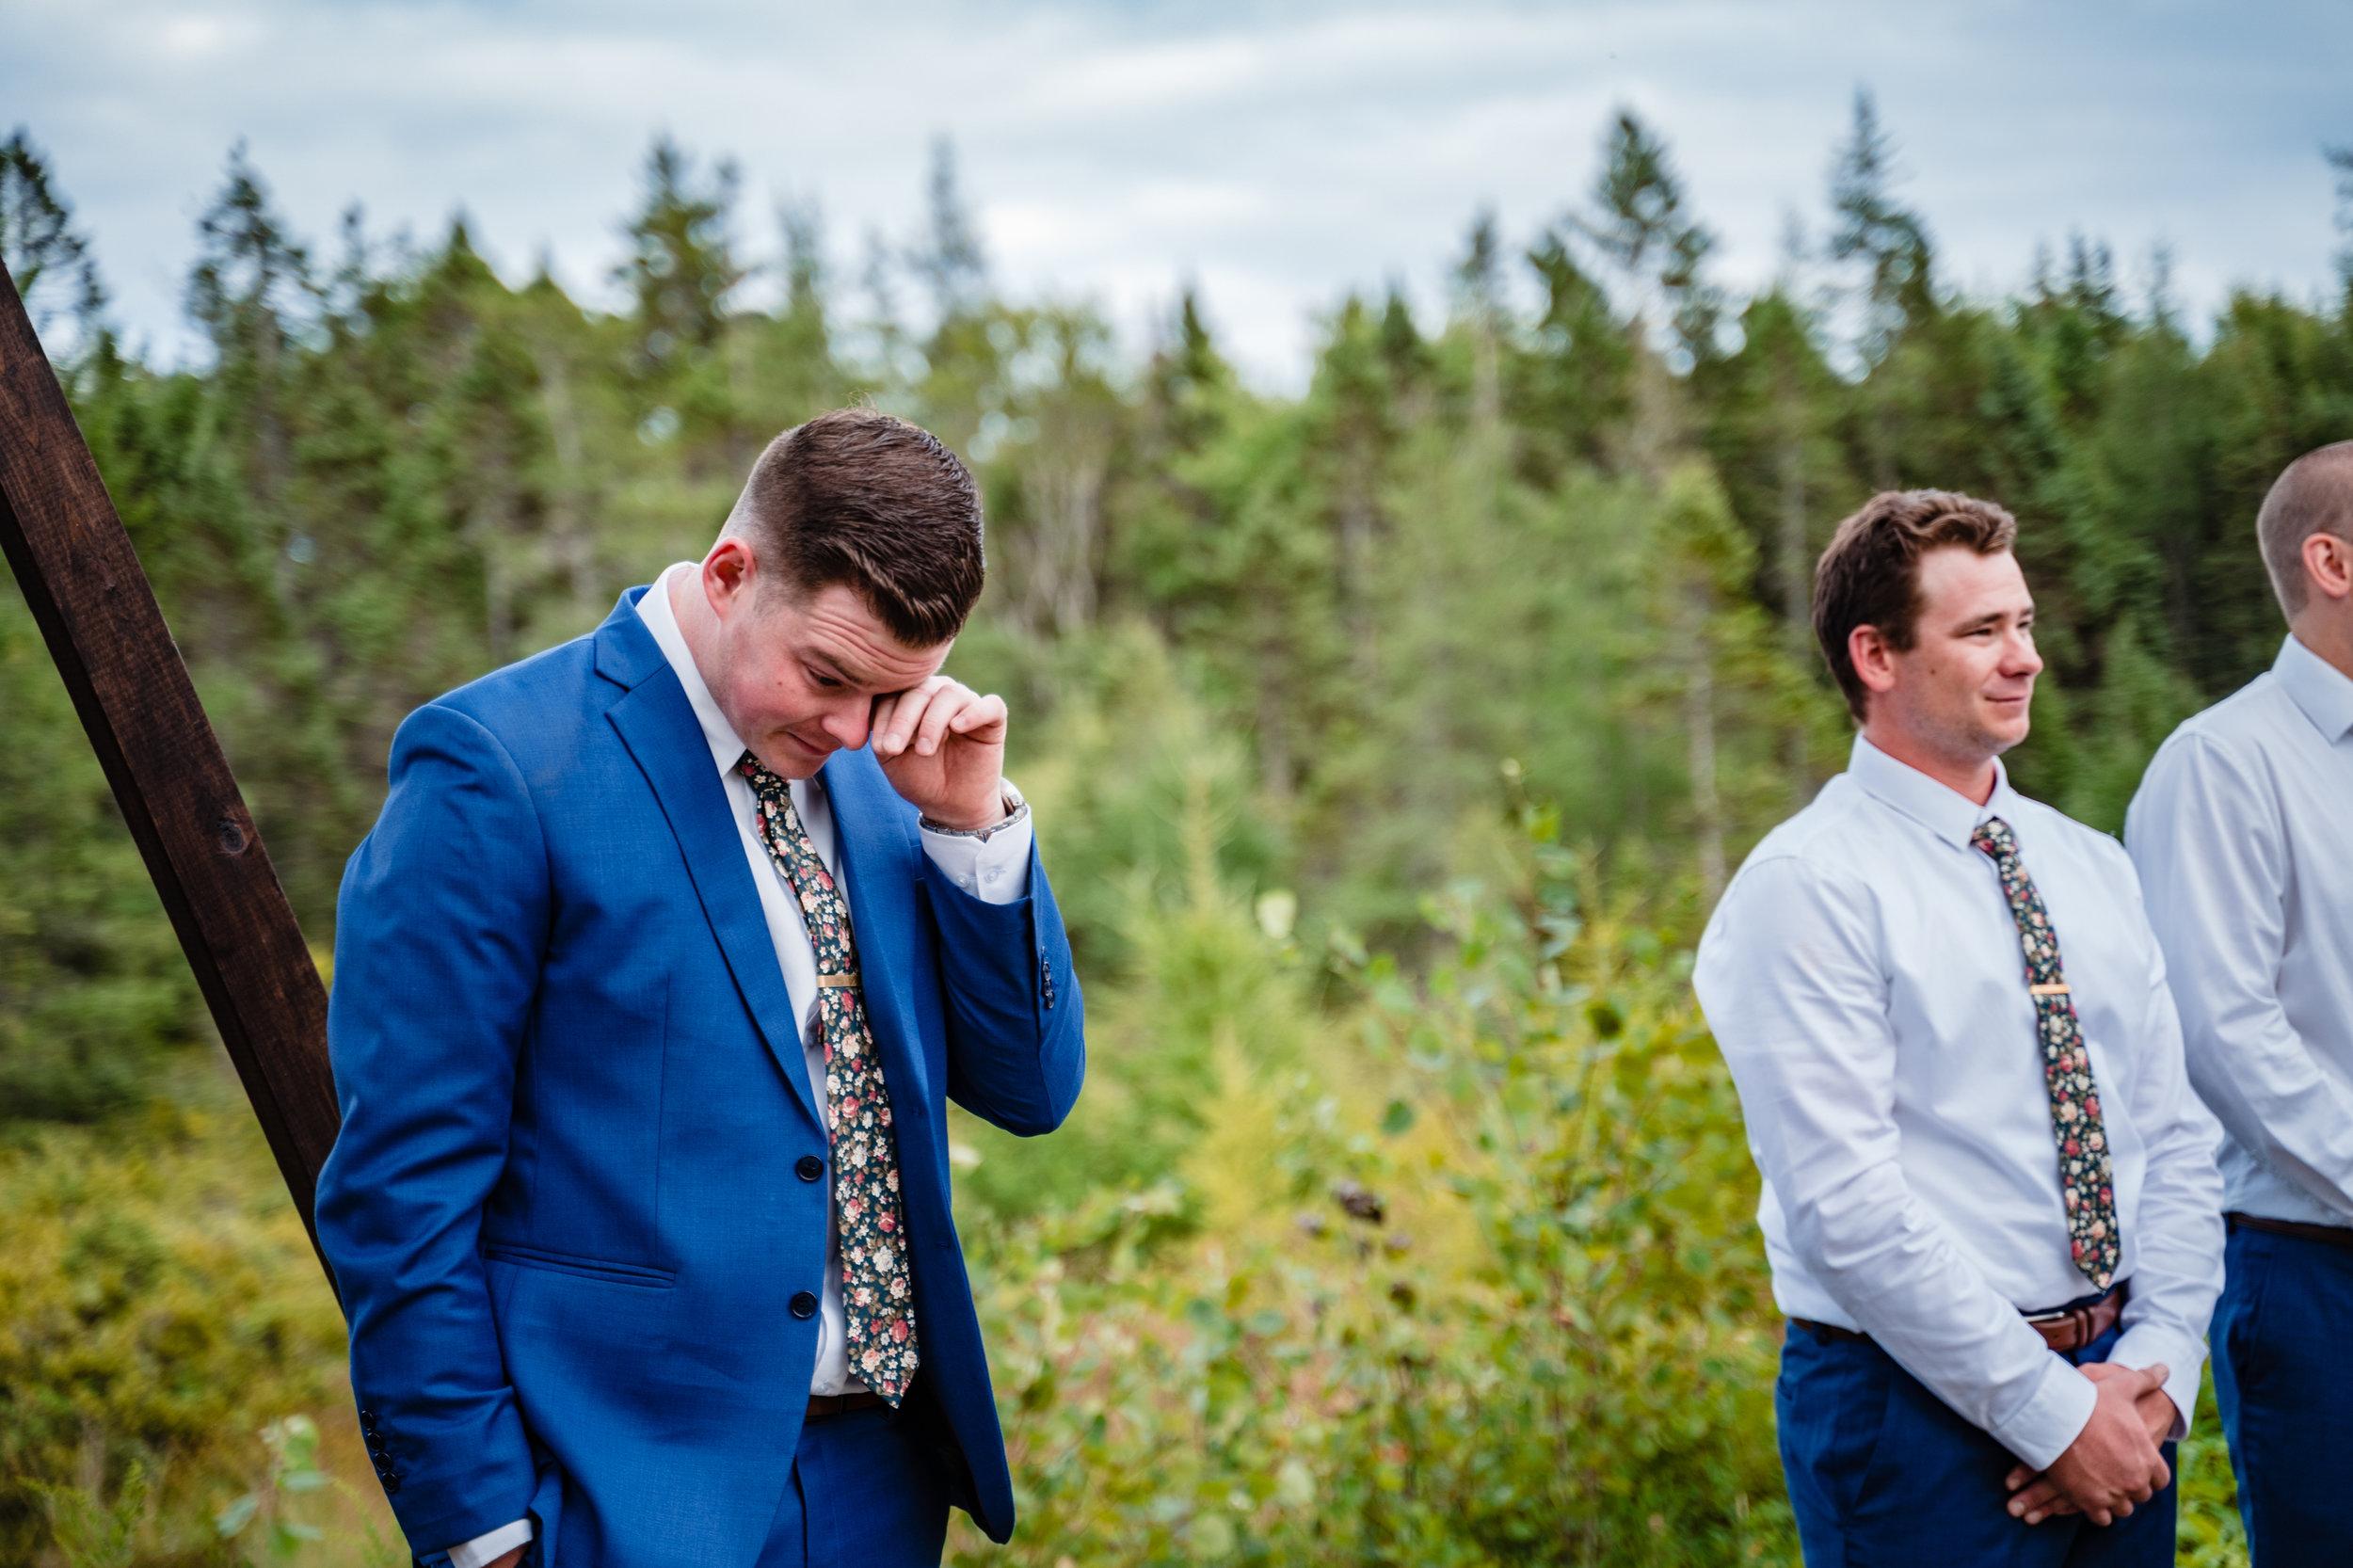 Janelle-Mitch-Halifax-Wedding-Nova-Scotia-Photography (105 of 163).jpg